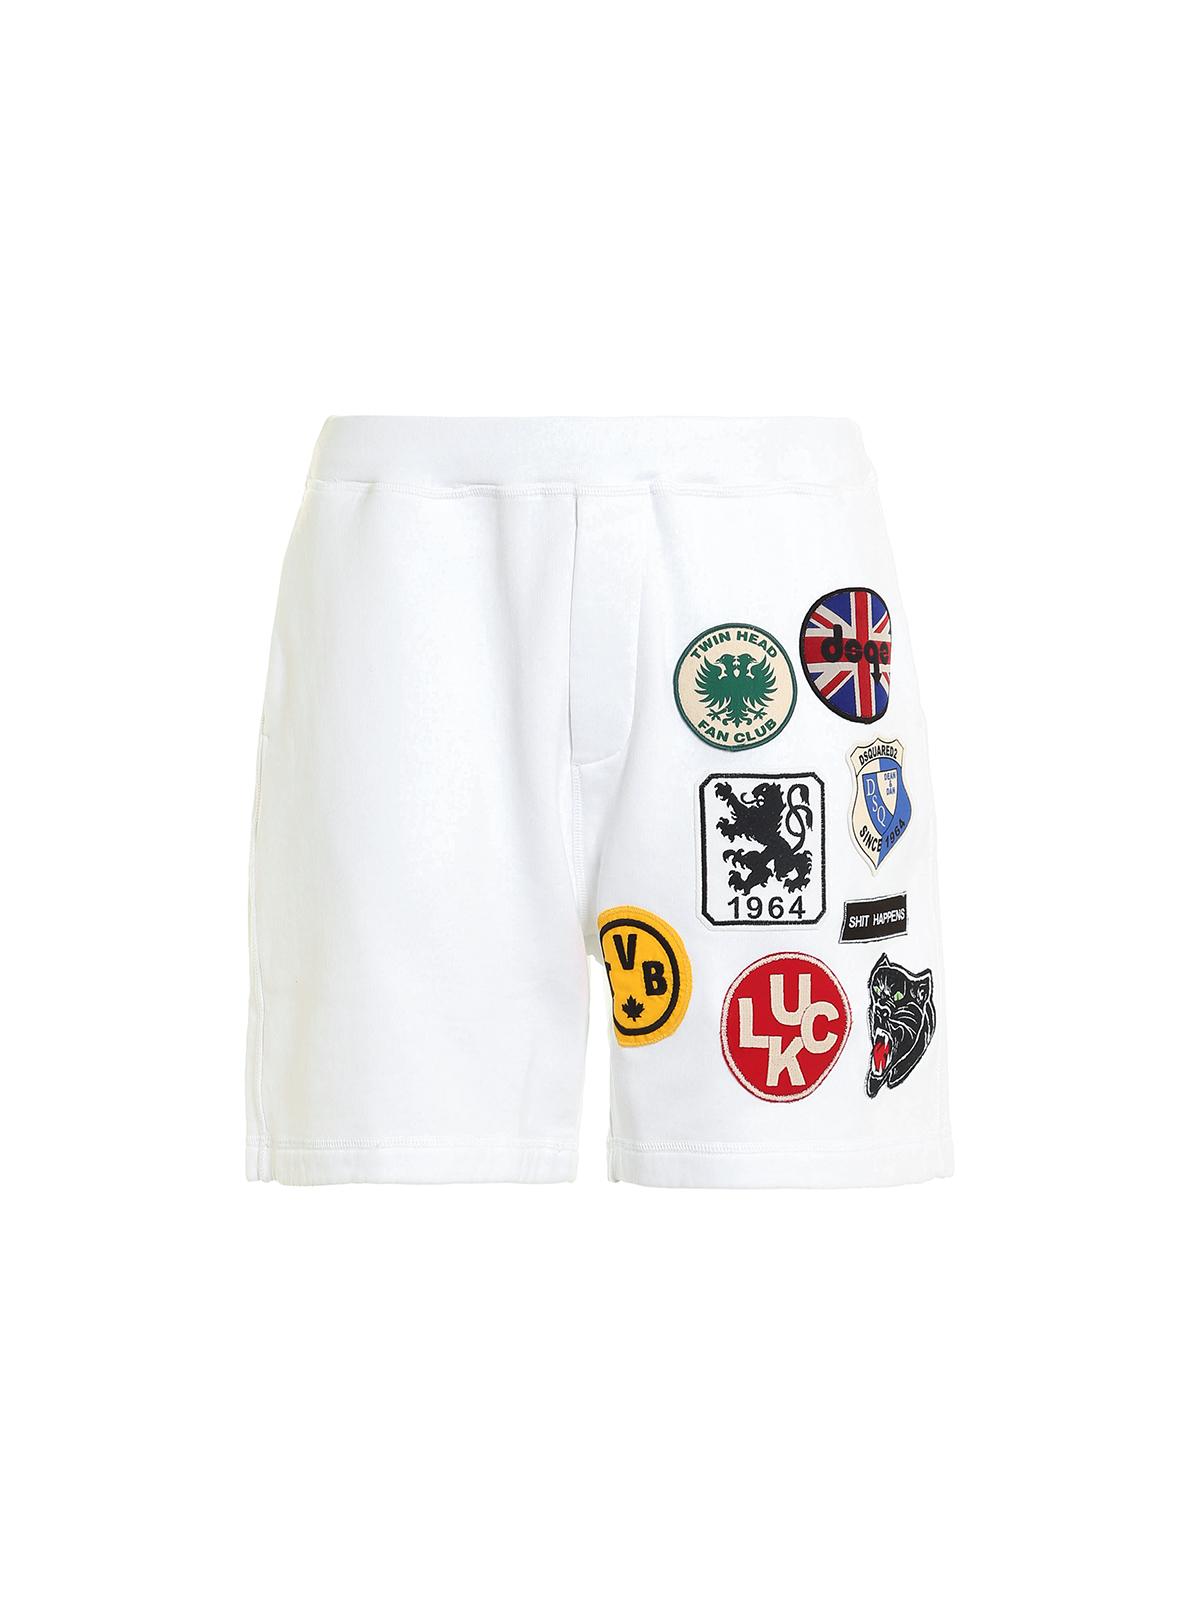 Dsquared2 Blanco Pantalón Hombre Chándal Para Pantalones Cortos 54AL3RjcqS